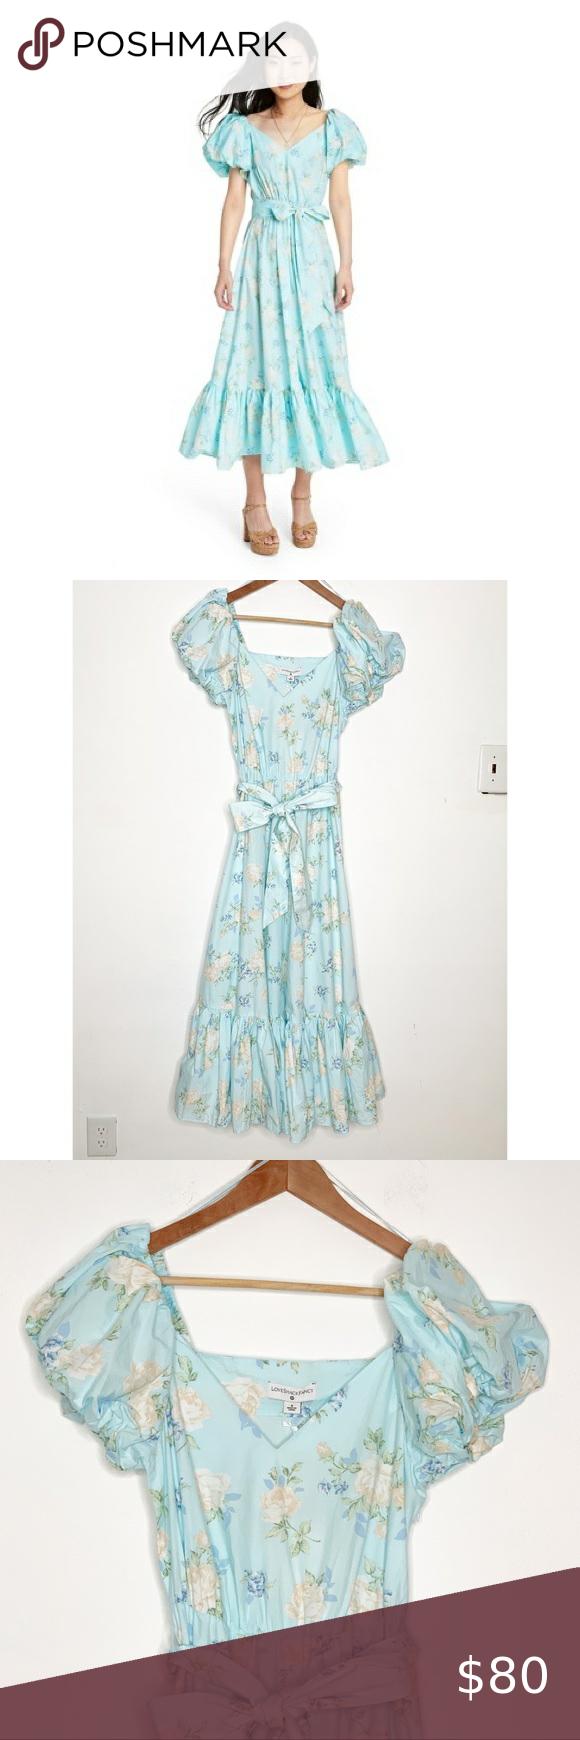 Loveshackfancy For Target Estelle Floral Dress Love Shack Fancy For Target Estelle Pale Blue Floral Romantic Exaggerated Pu Dresses Floral Dress Clothes Design [ 1740 x 580 Pixel ]